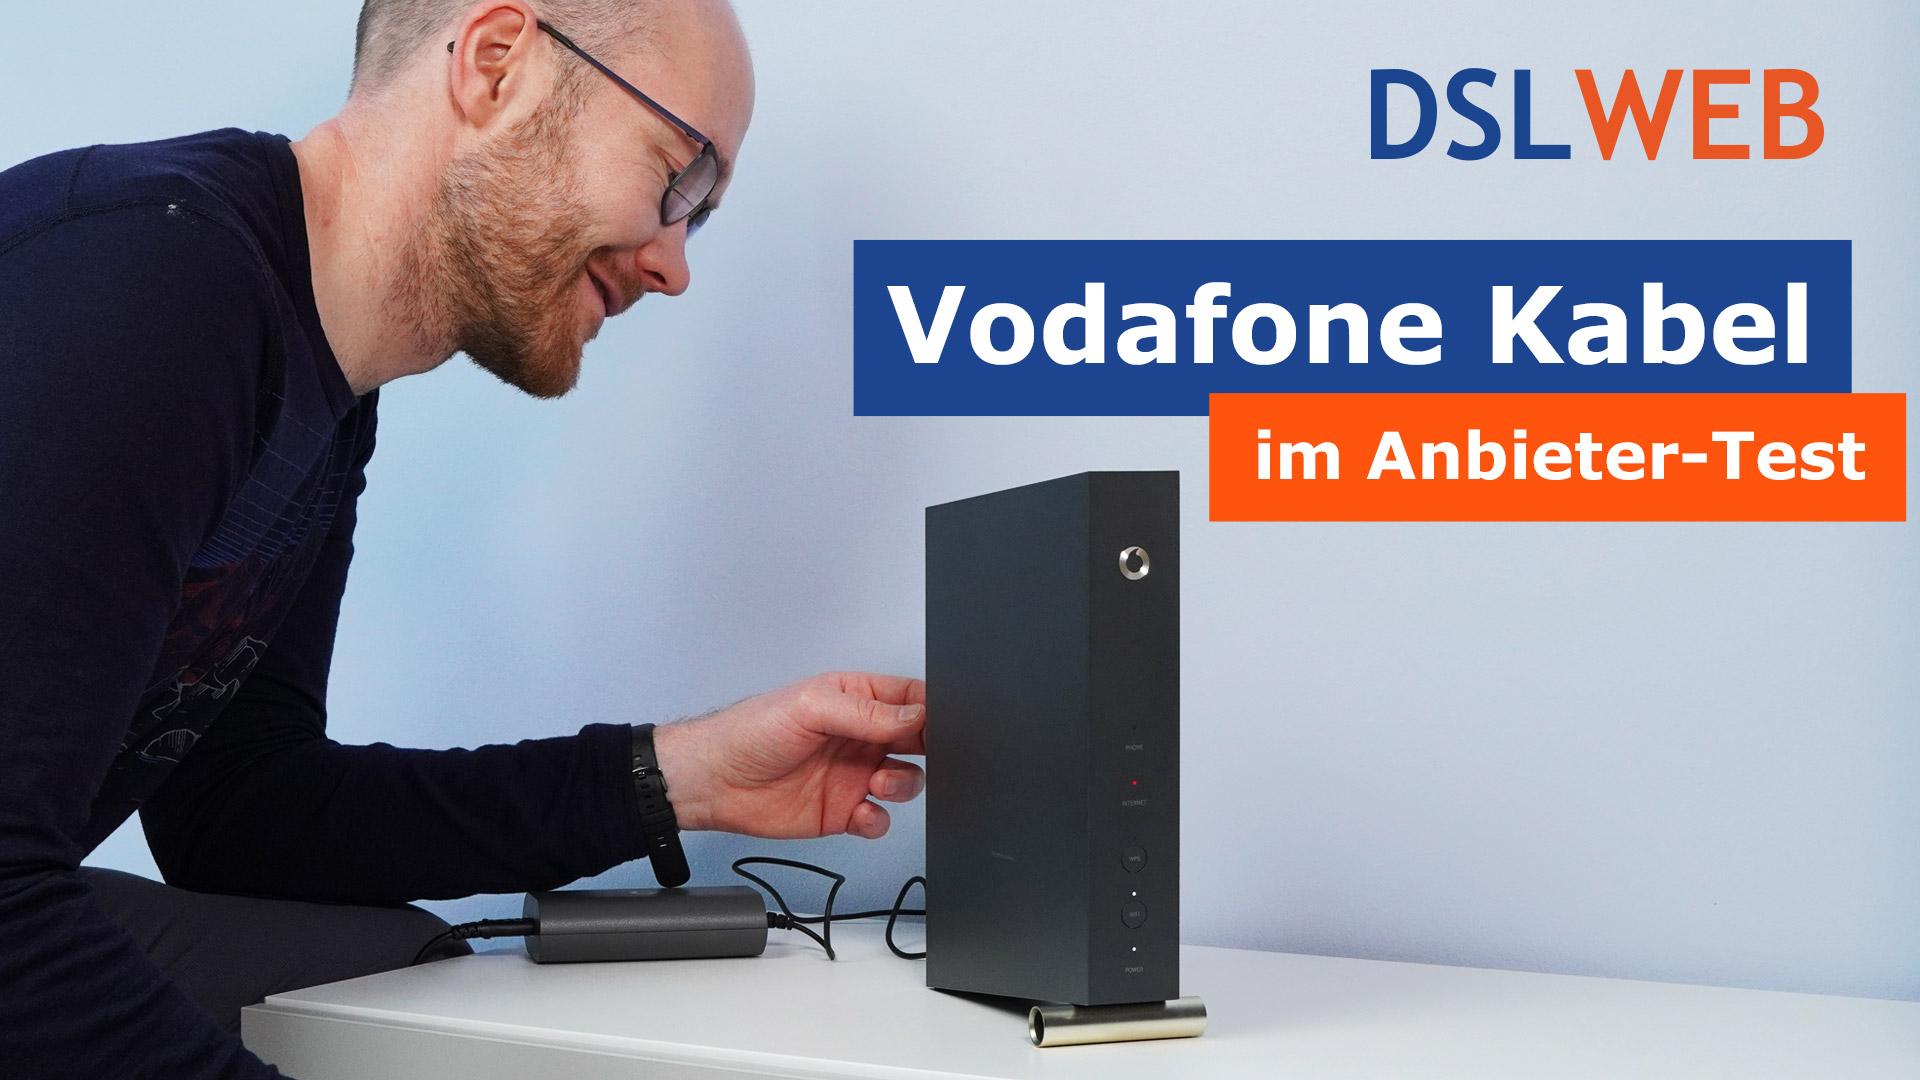 Vodafone Kabel Beschwerde